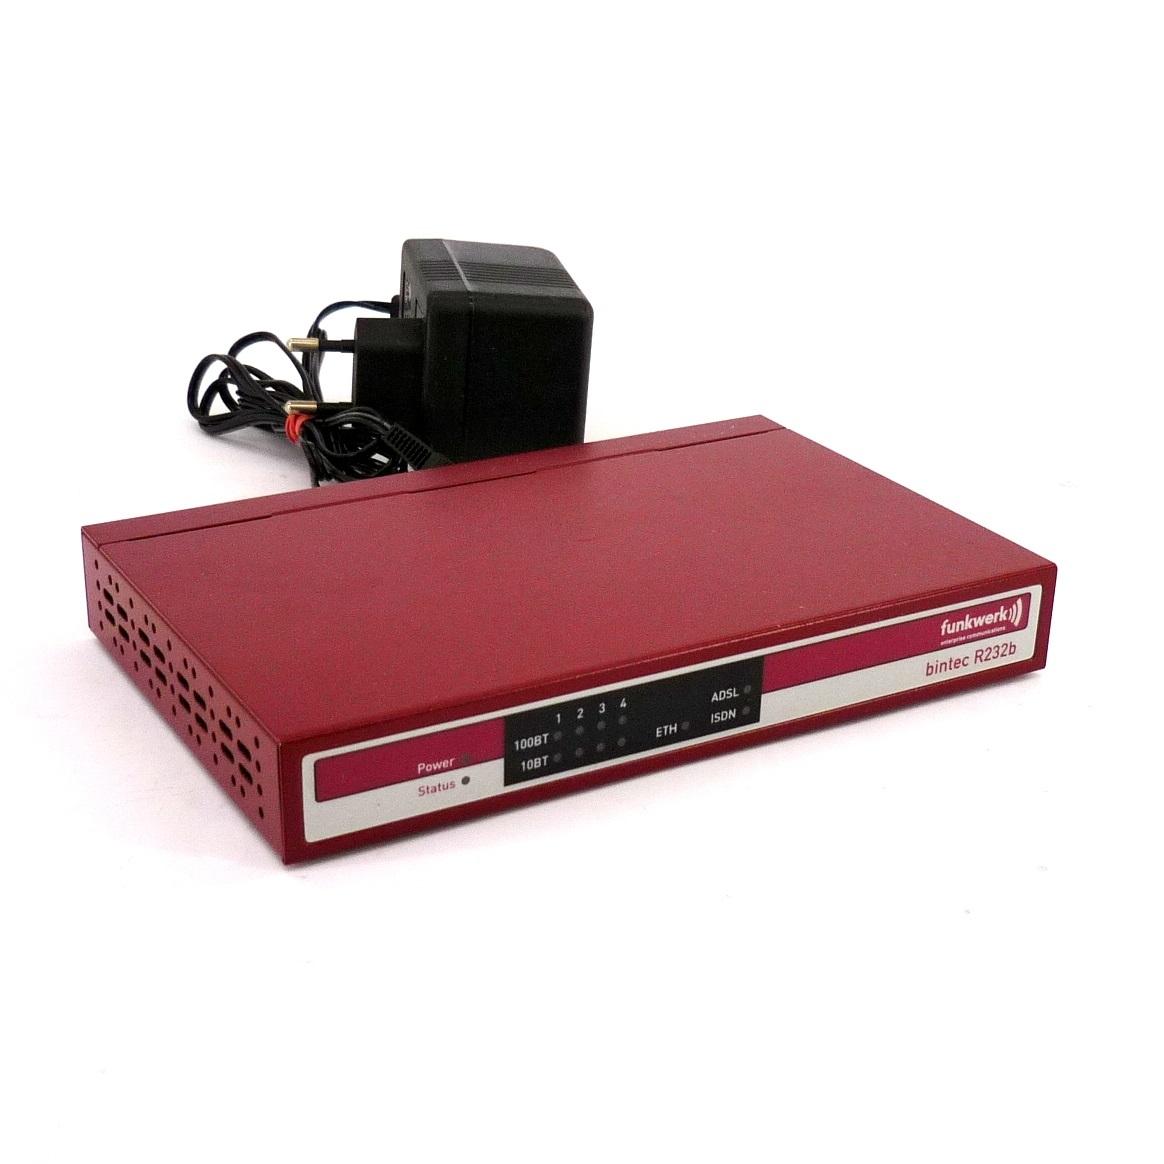 funkwerk bintec r232b 4 port wireless router adsl modem. Black Bedroom Furniture Sets. Home Design Ideas